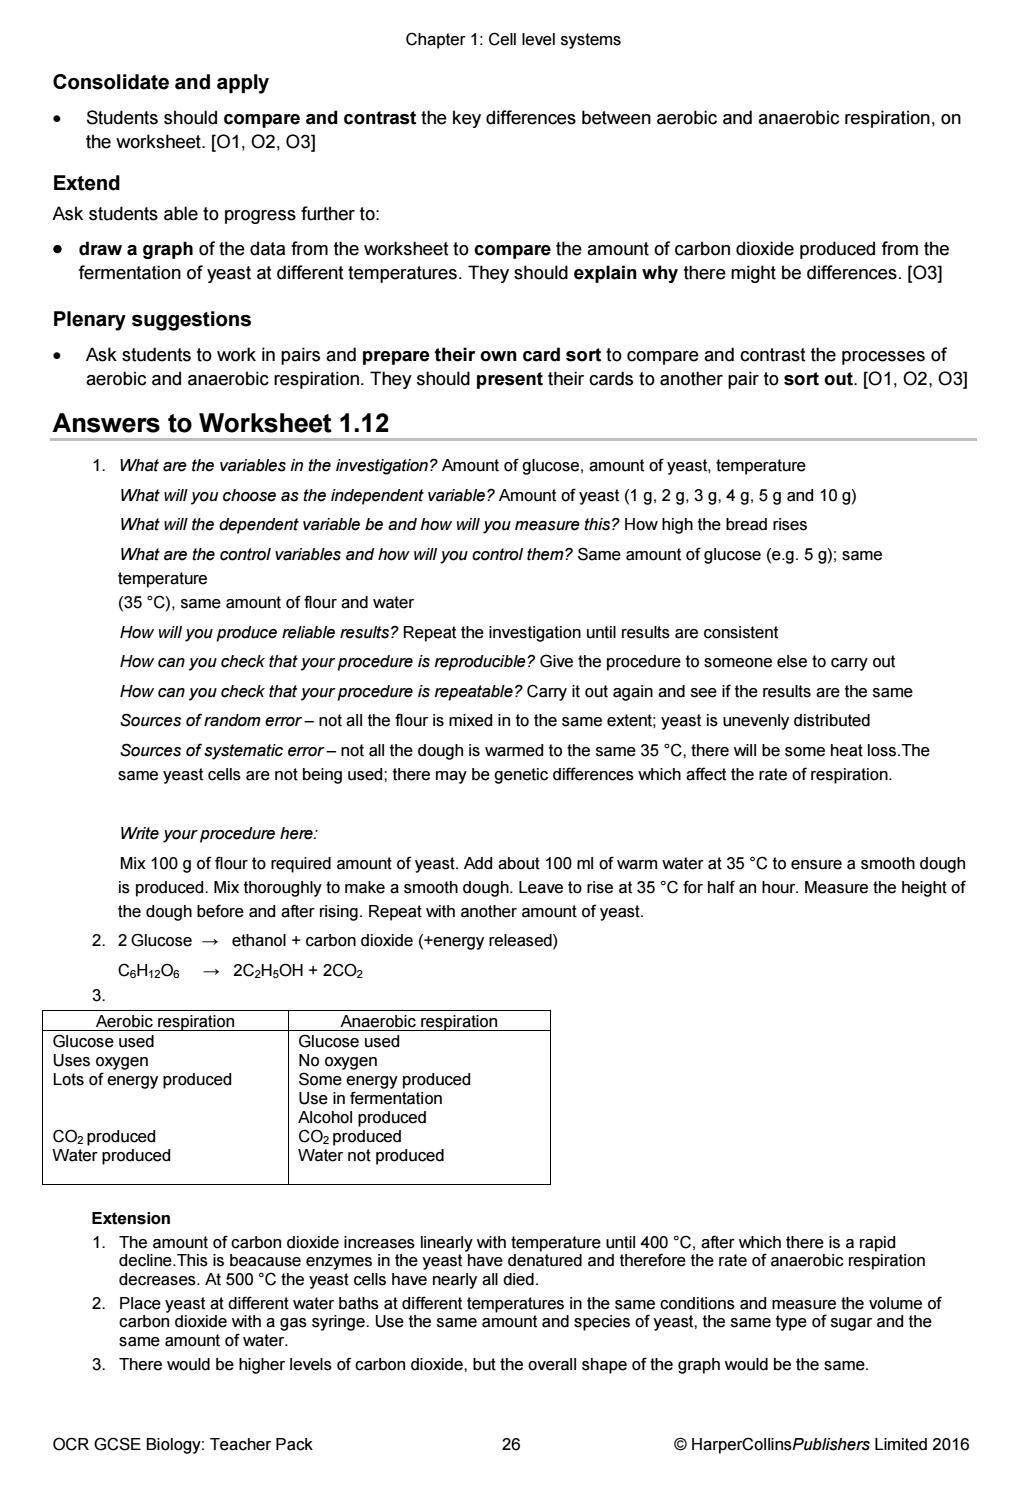 OCR GCSE Biology: Teacher Pack by Collins - issuu